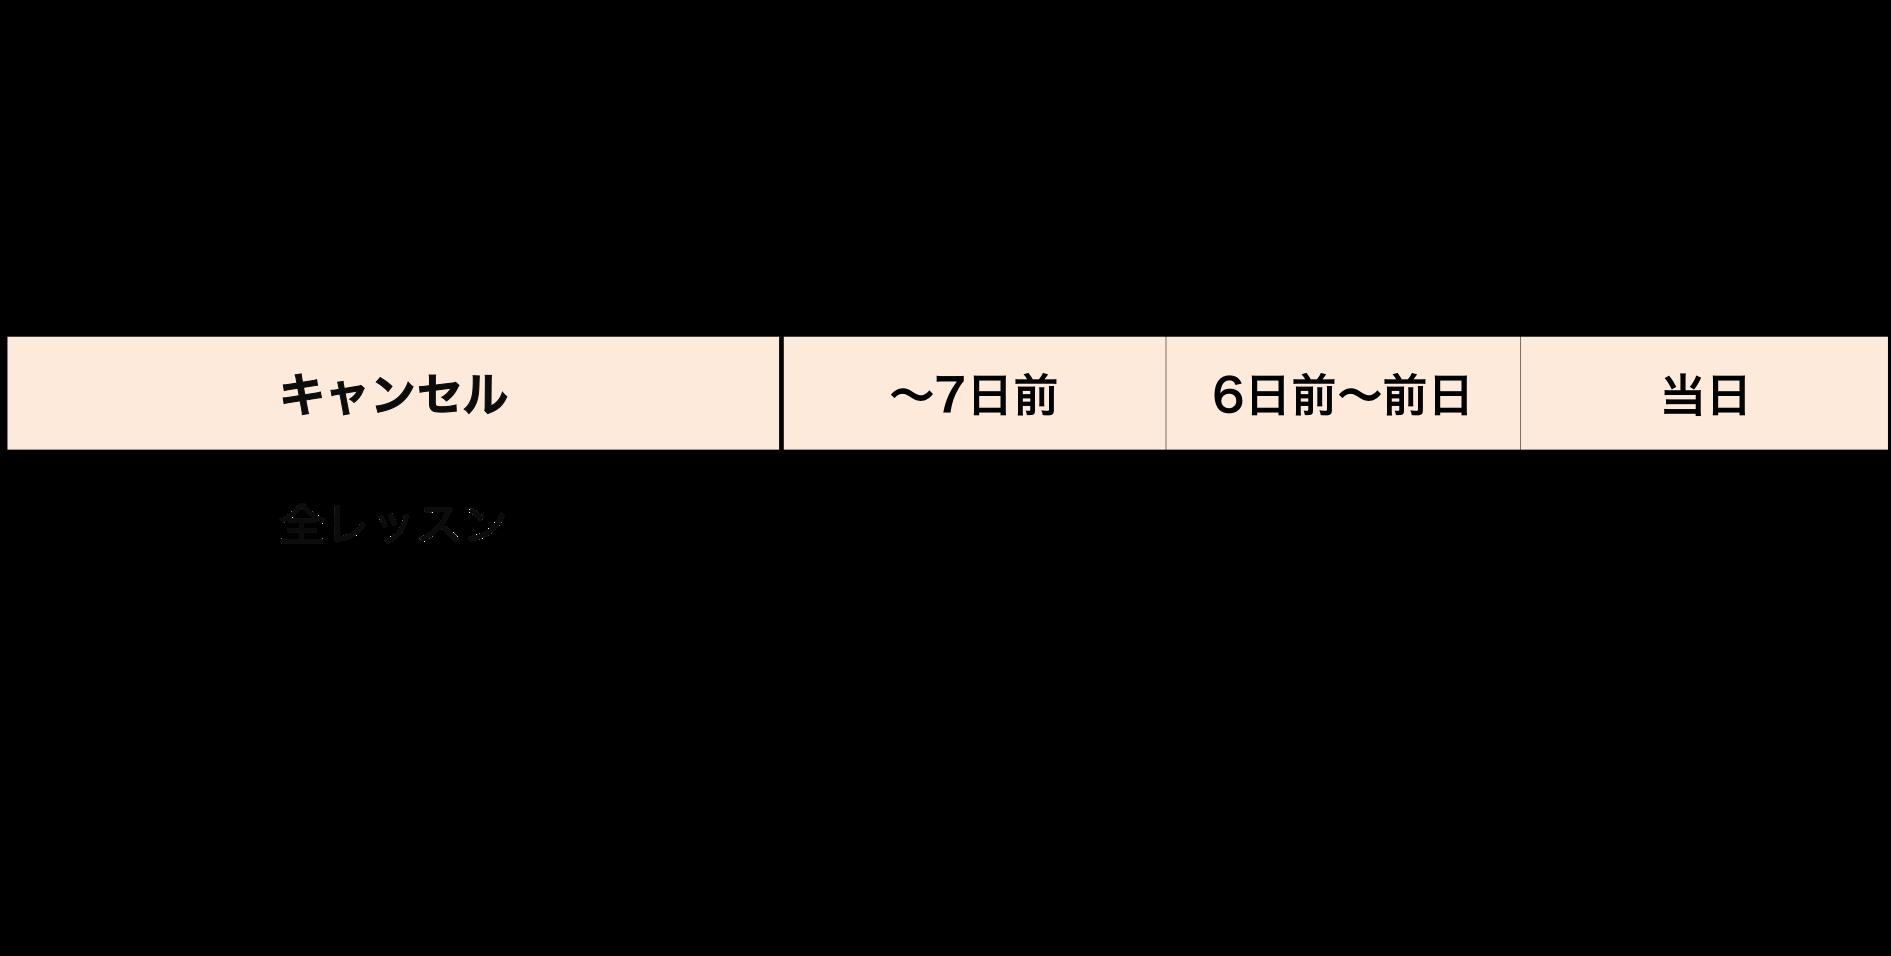 2017%e3%82%ad%e3%83%a3%e3%83%b3%e3%82%bb%e3%83%ab%e3%83%9d%e3%83%aa%e3%82%b7%e3%83%bc